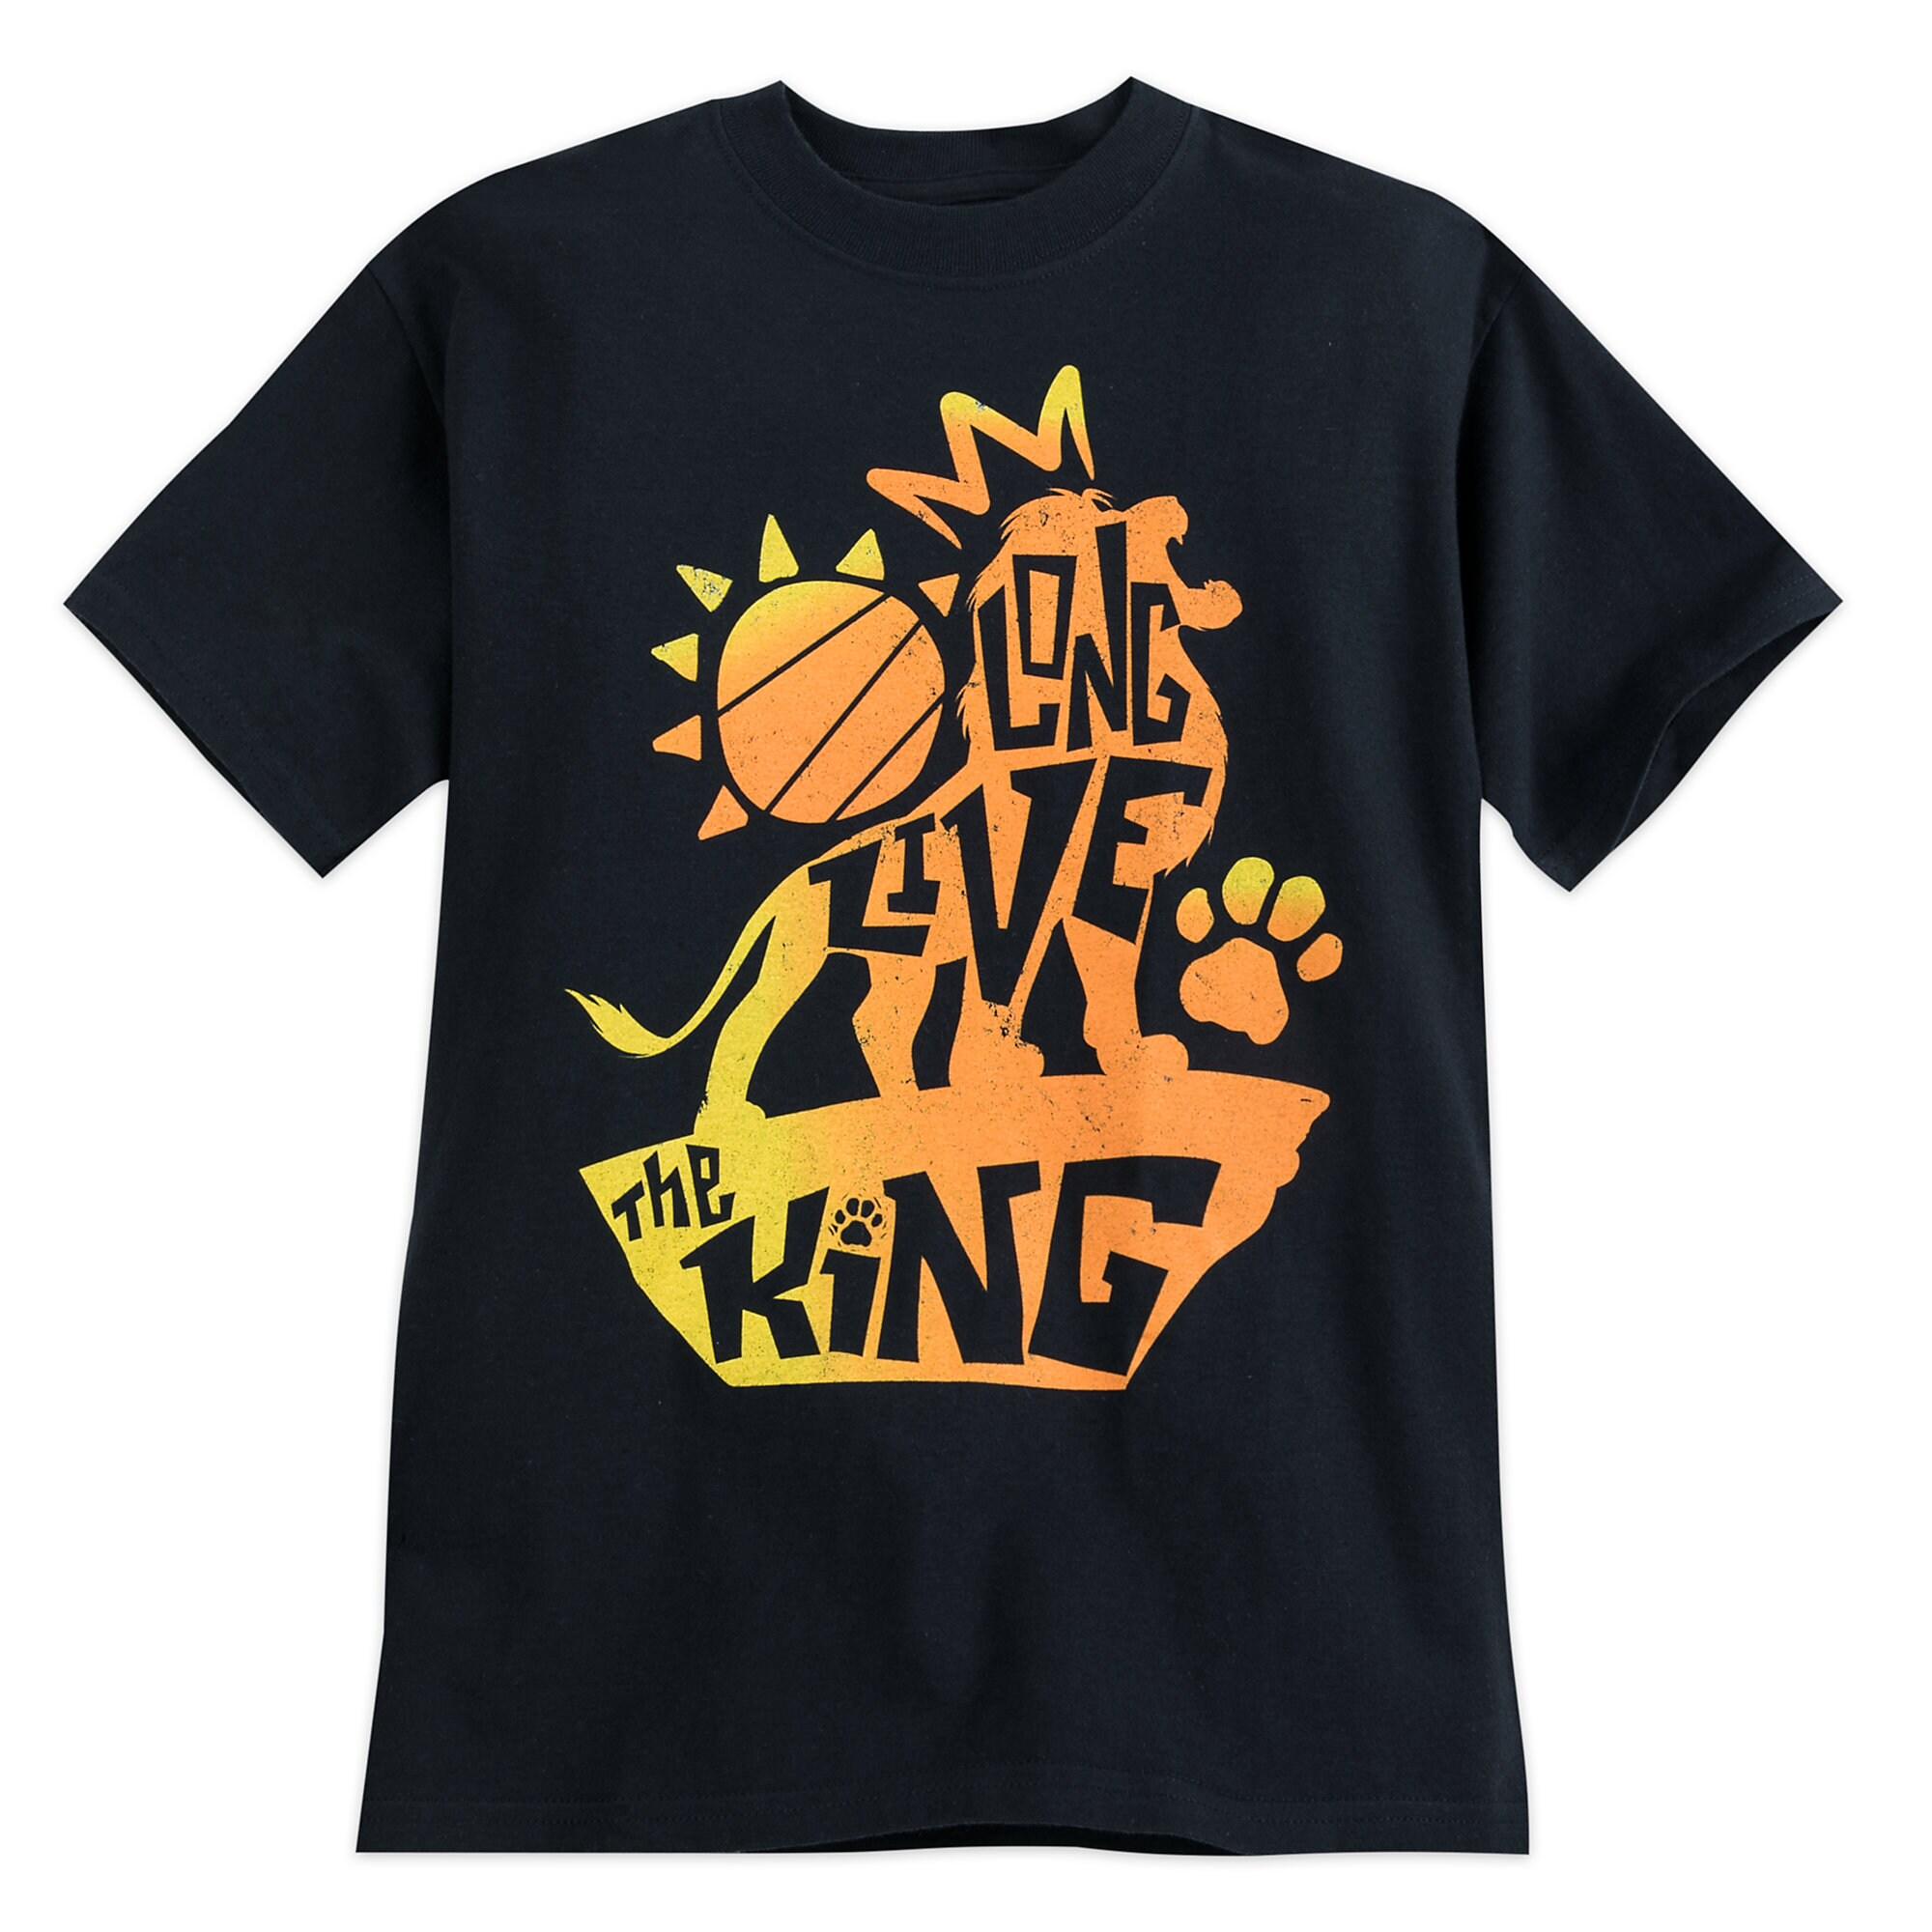 f8a9d0f37e9e The Lion King T-Shirt for Kids | shopDisney